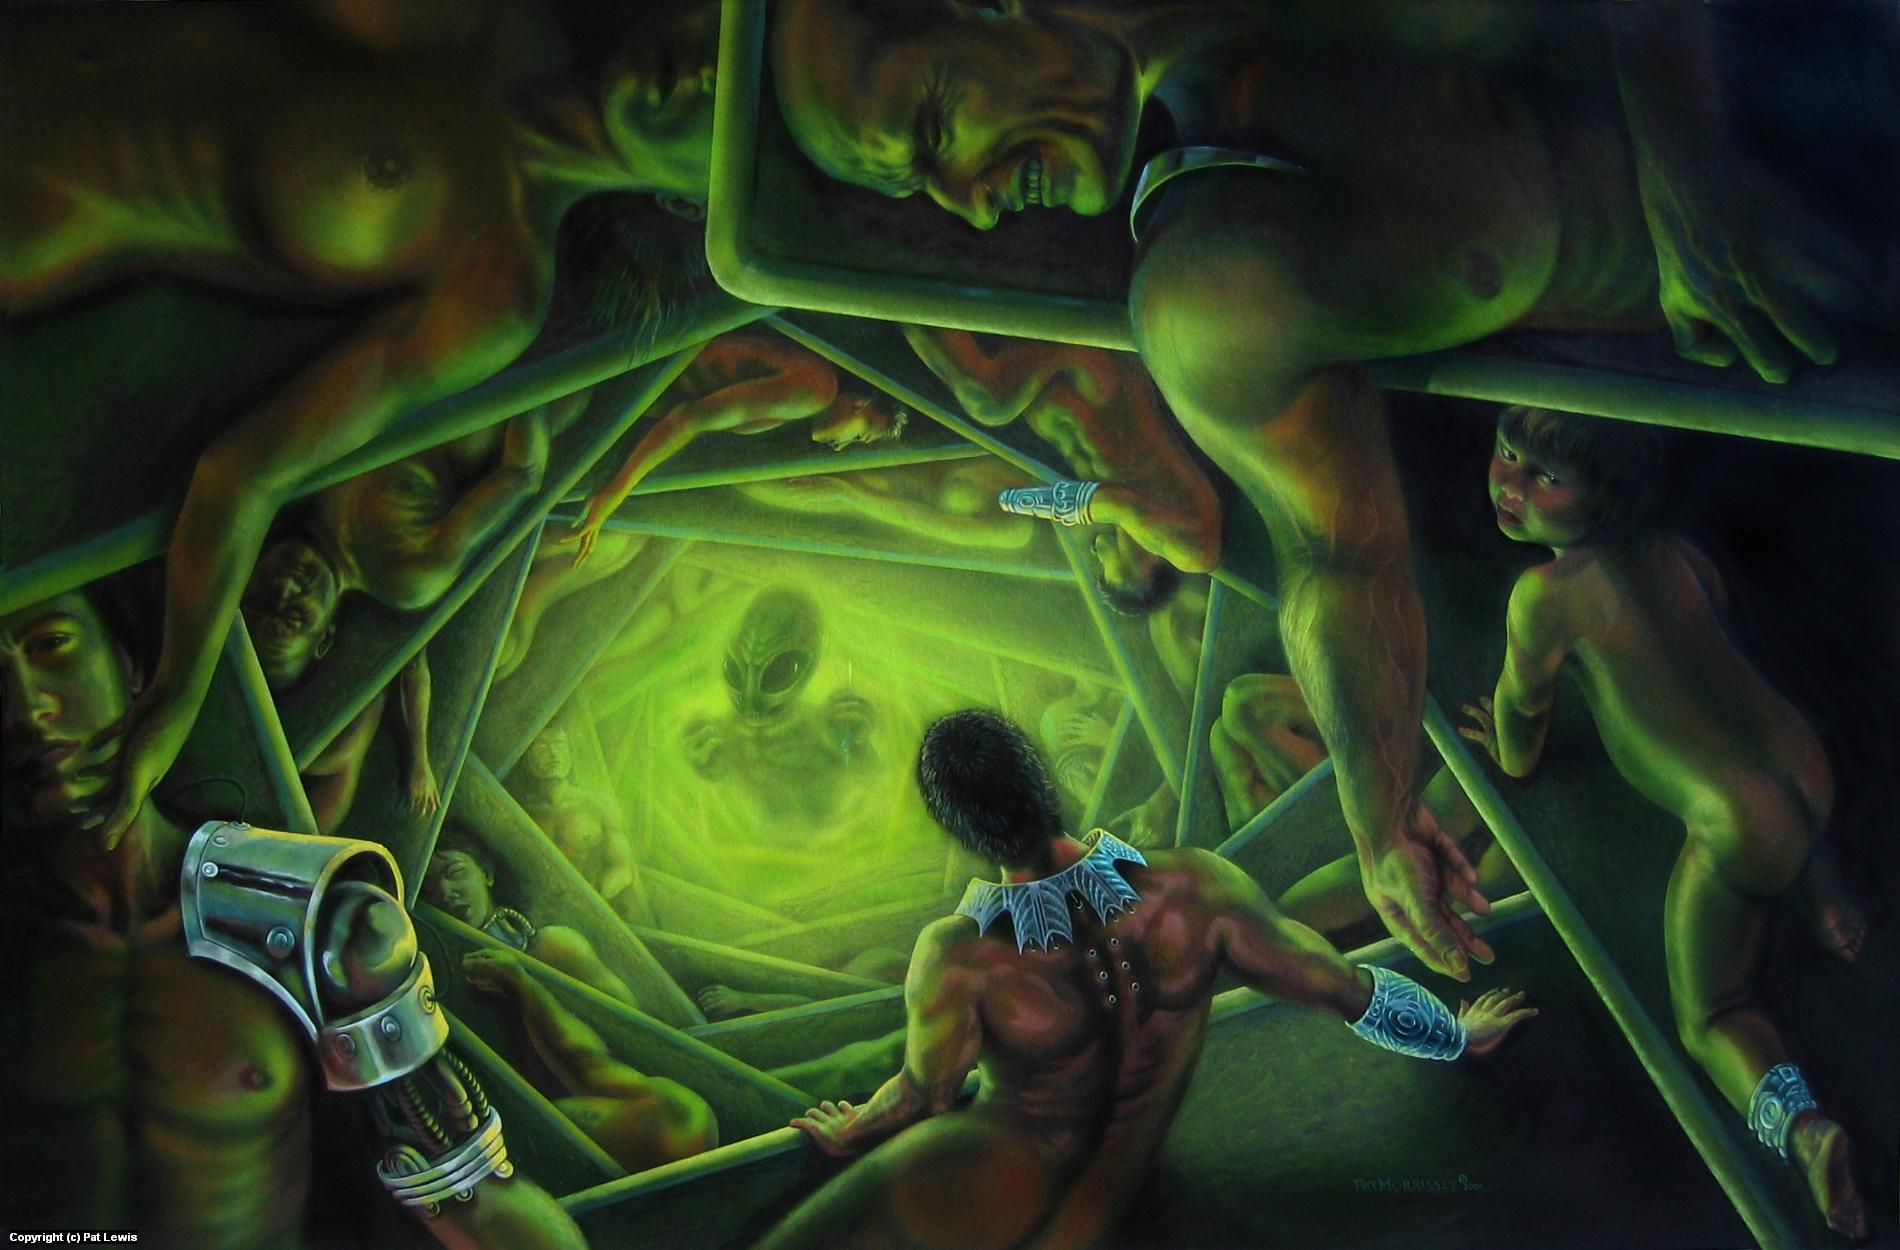 One Terrible Night Artwork by Pat morrissey-Lewis